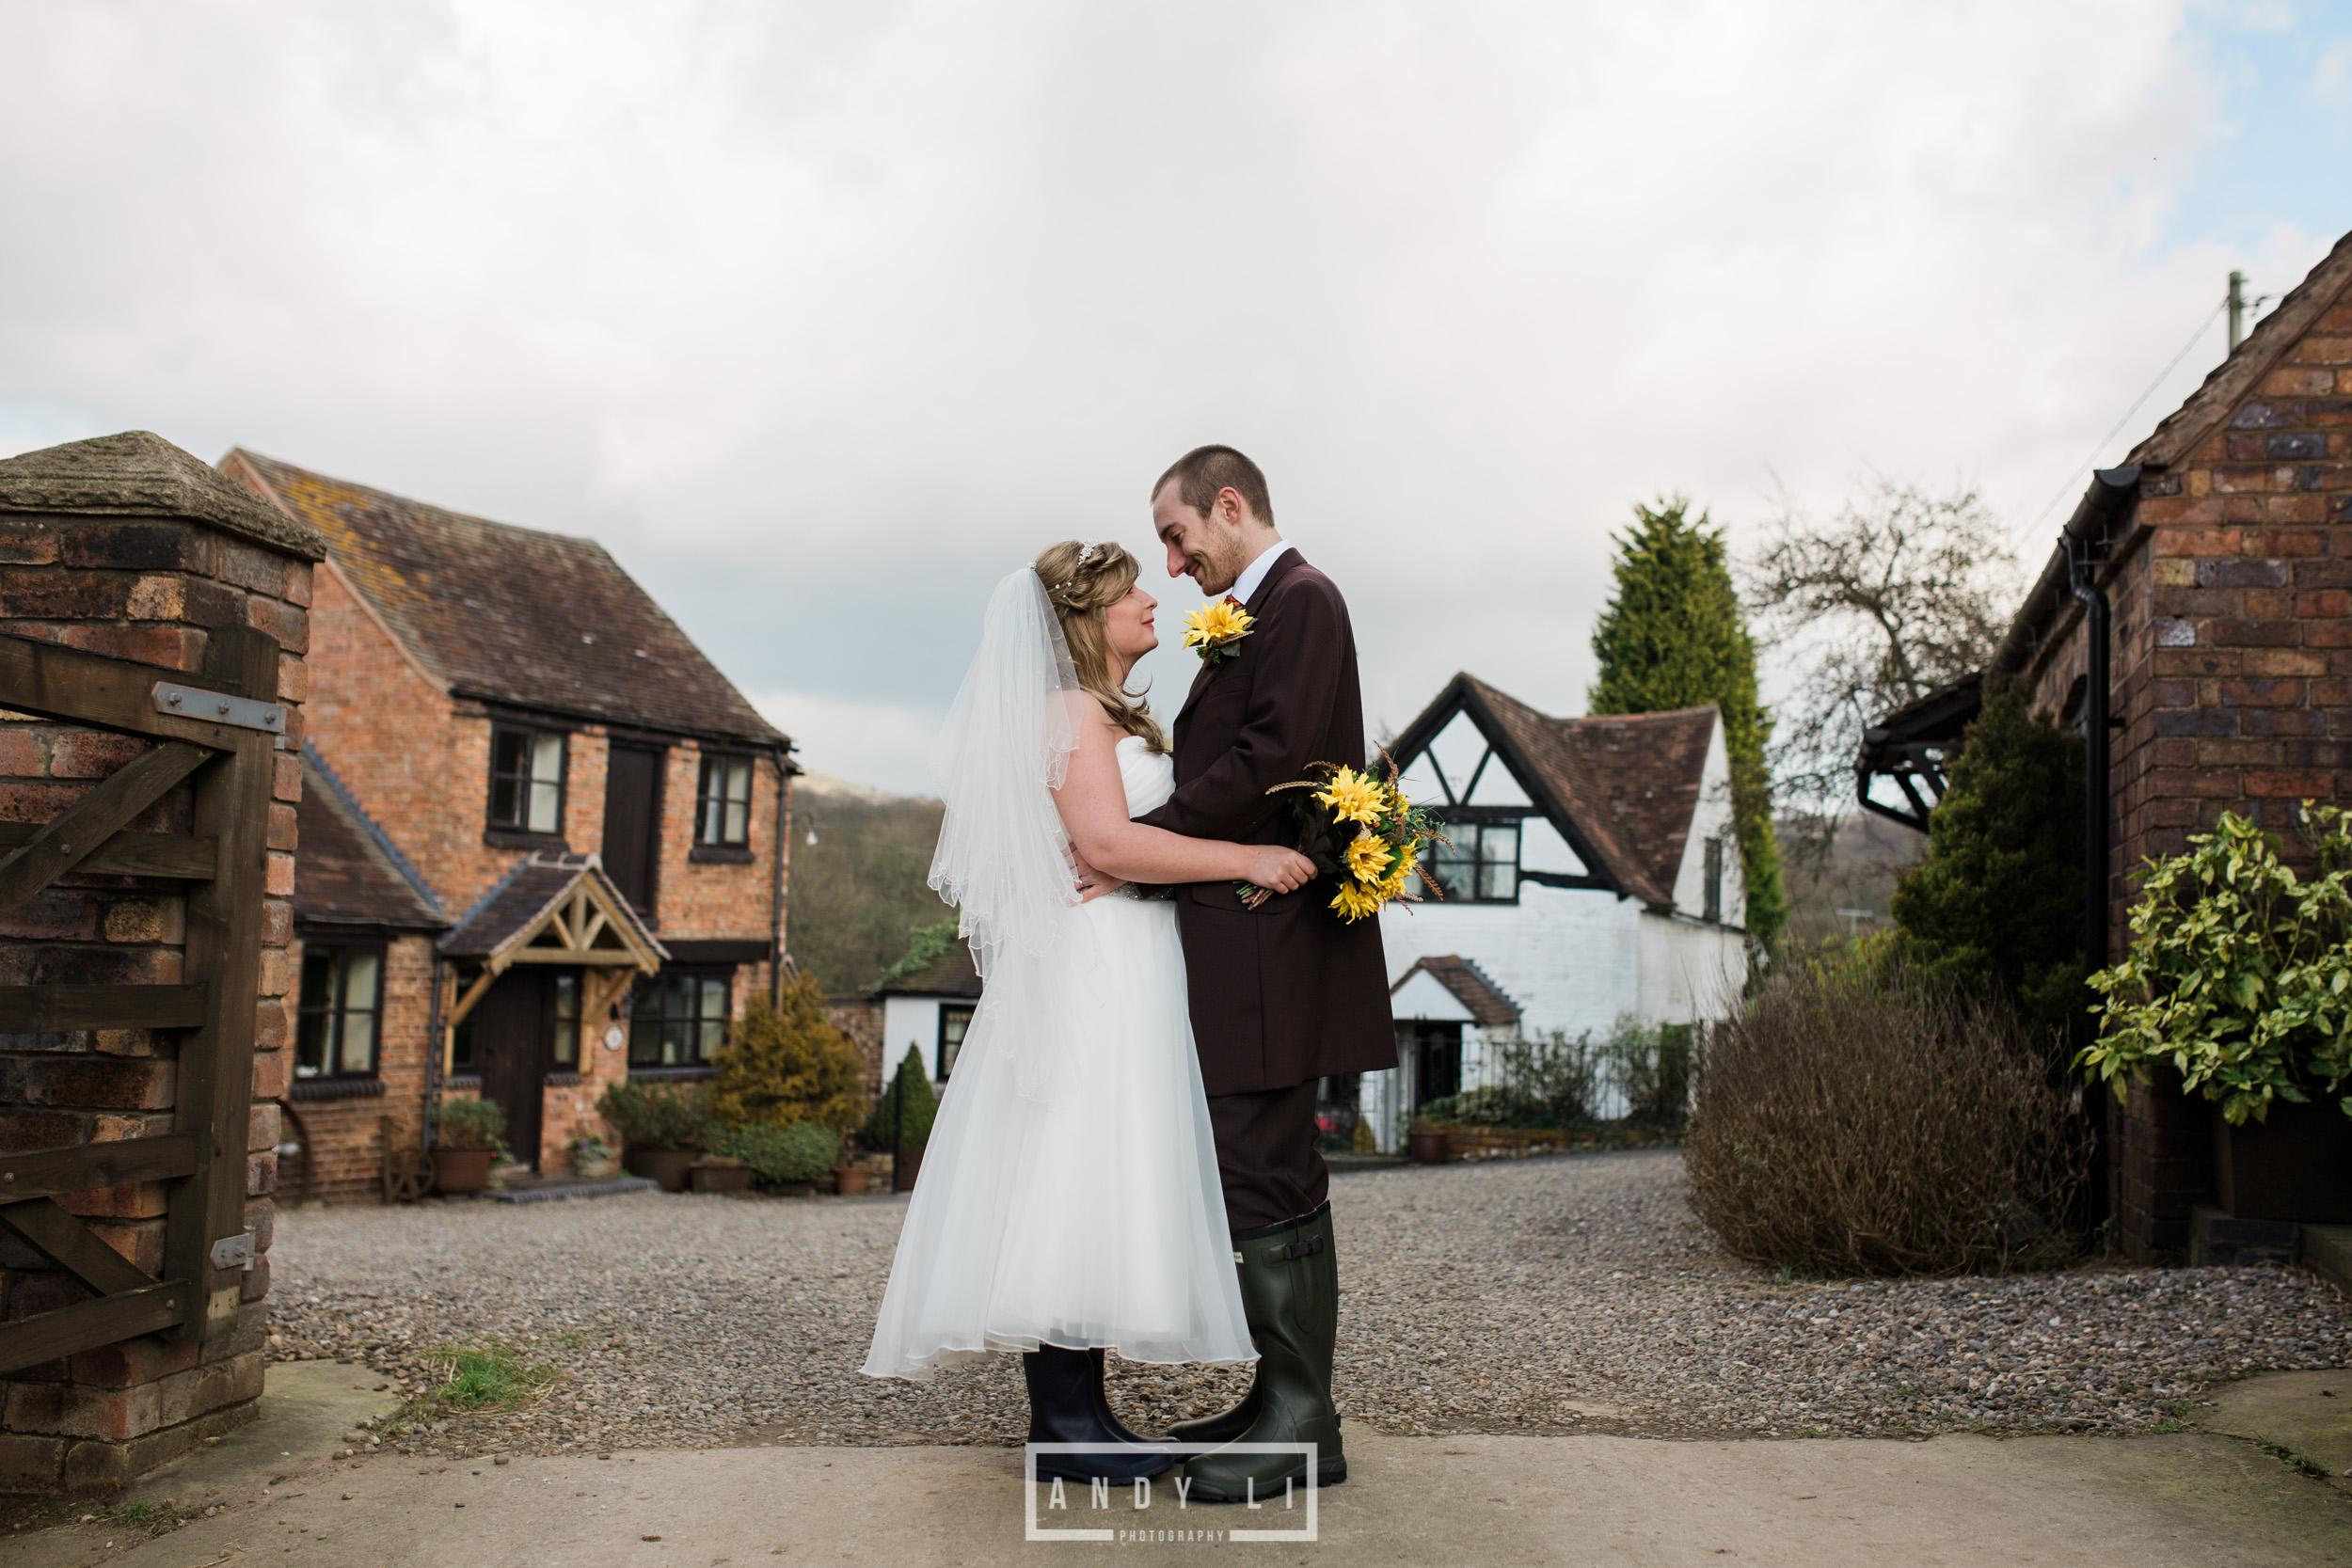 Morrells Wood Farm Weddings-060.jpg